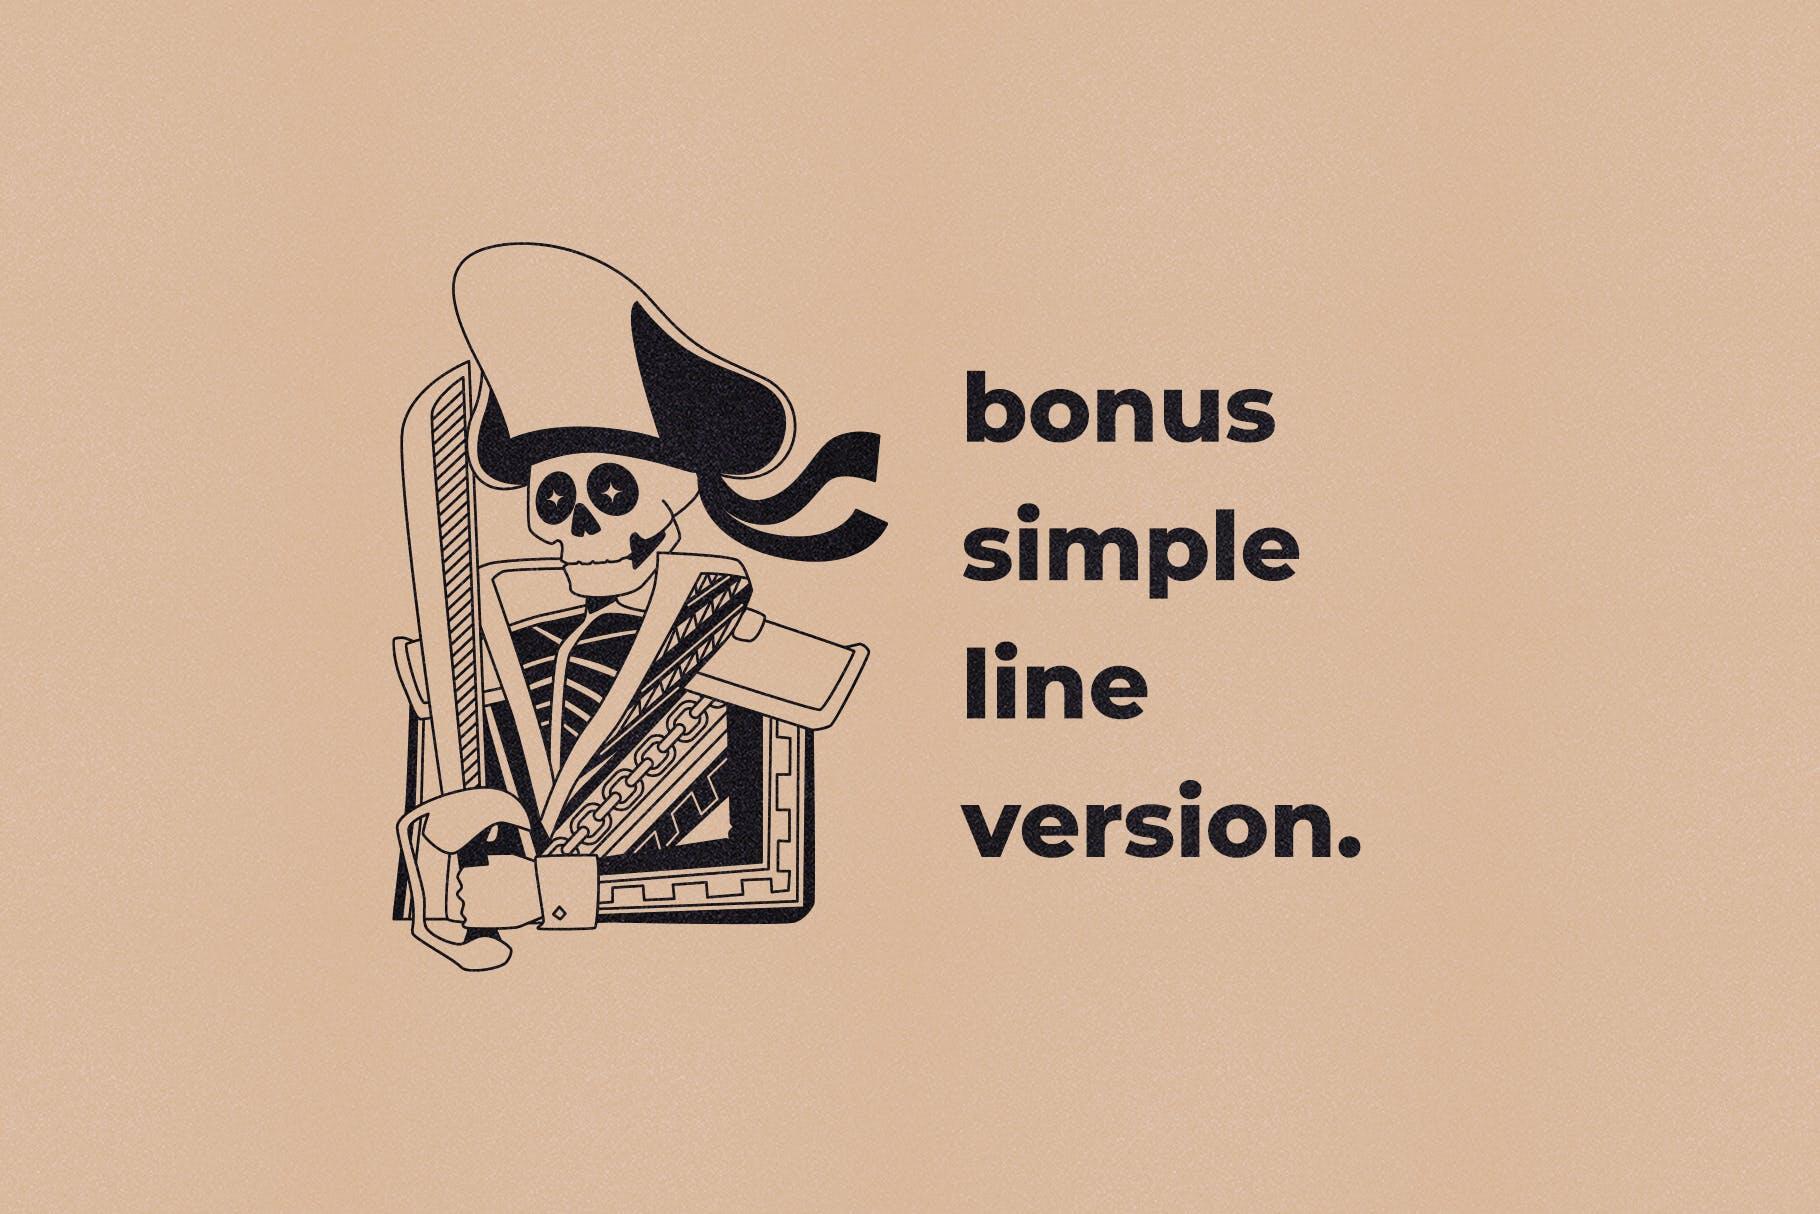 海盗元素徽标LOGO插图设计矢量素材 Illustration & Logo Pack V1插图(4)